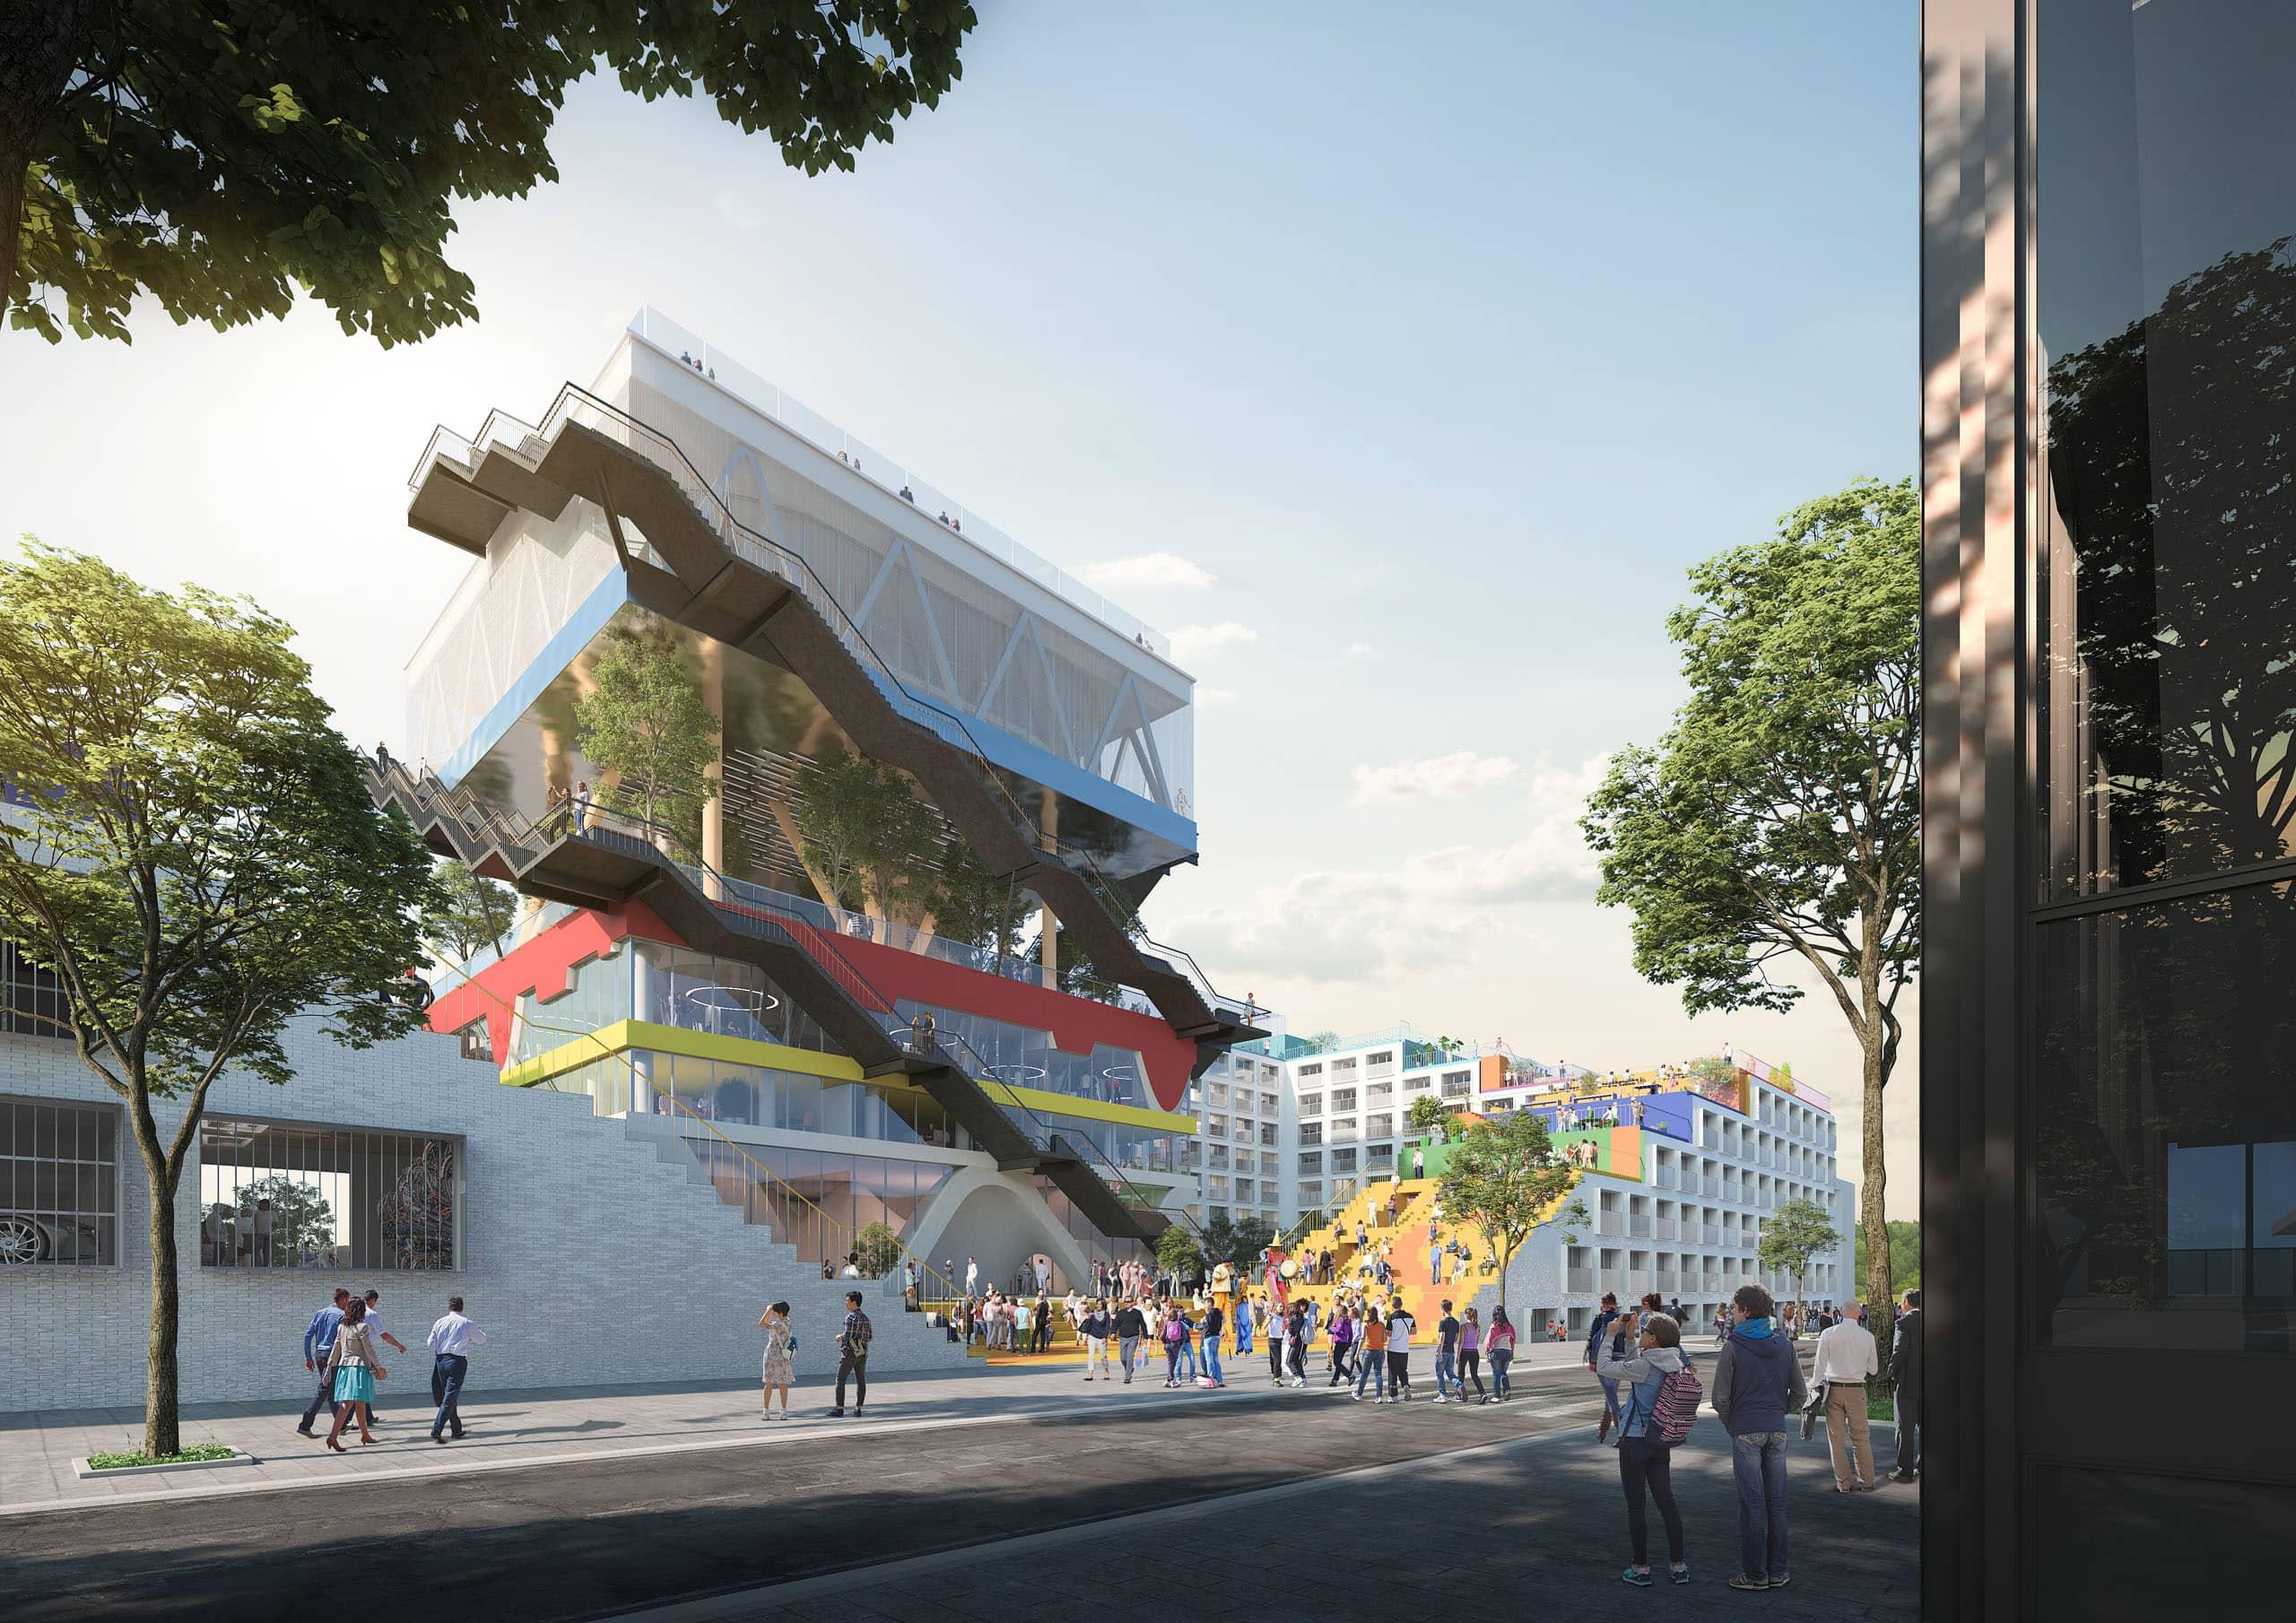 Проект Expo Pavilion 2.0 от MVRDV. Источник изображения: MVRDV